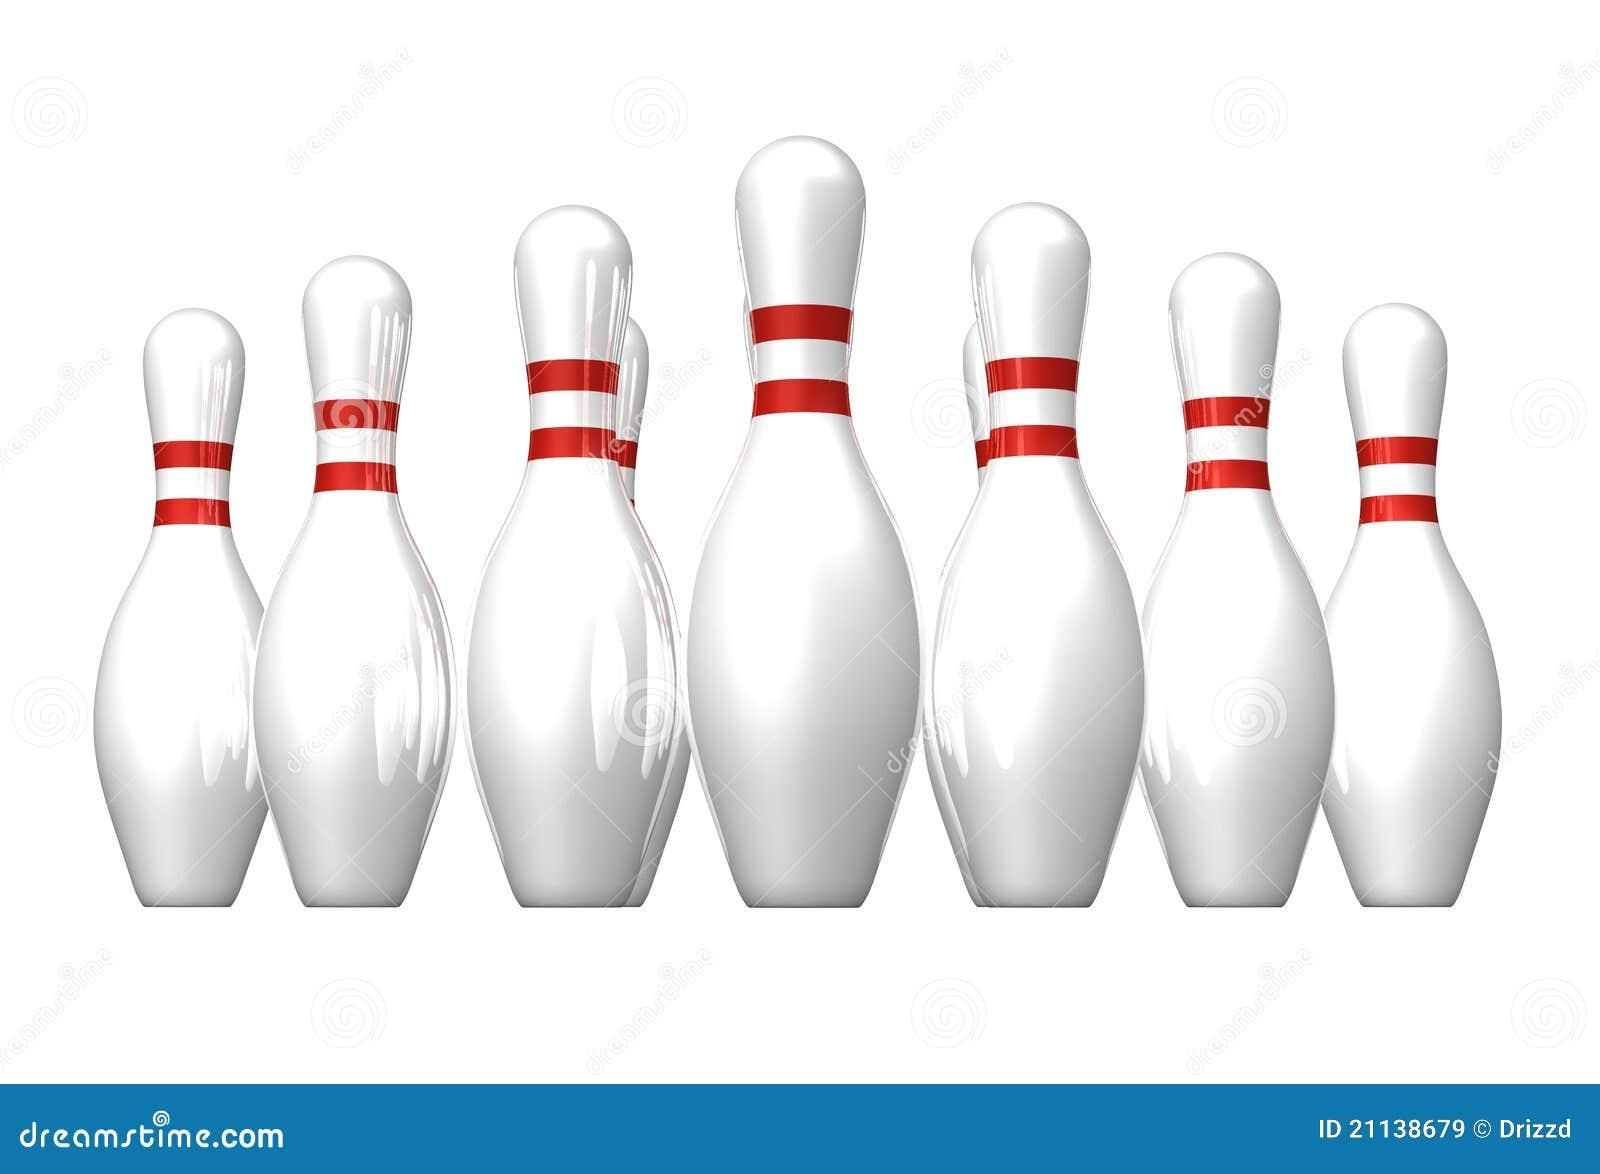 how to start a ten pin bowling business